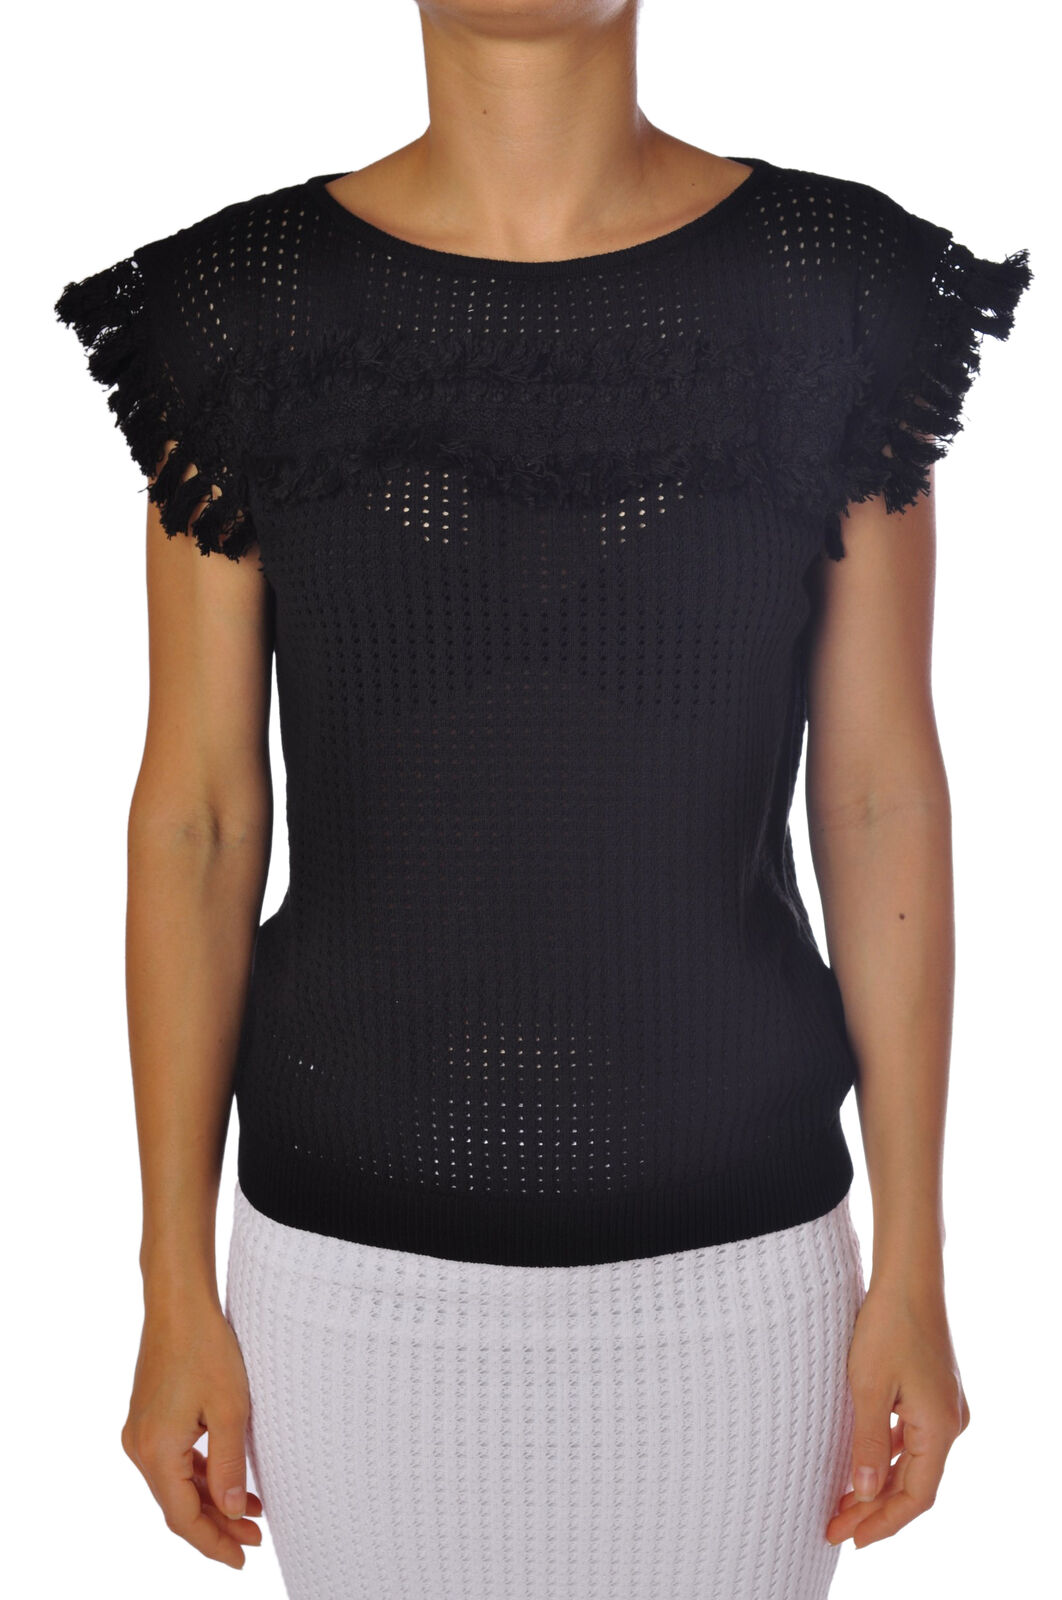 Rosao - Shirts-Blouses - woman - Blau - 803318C184921